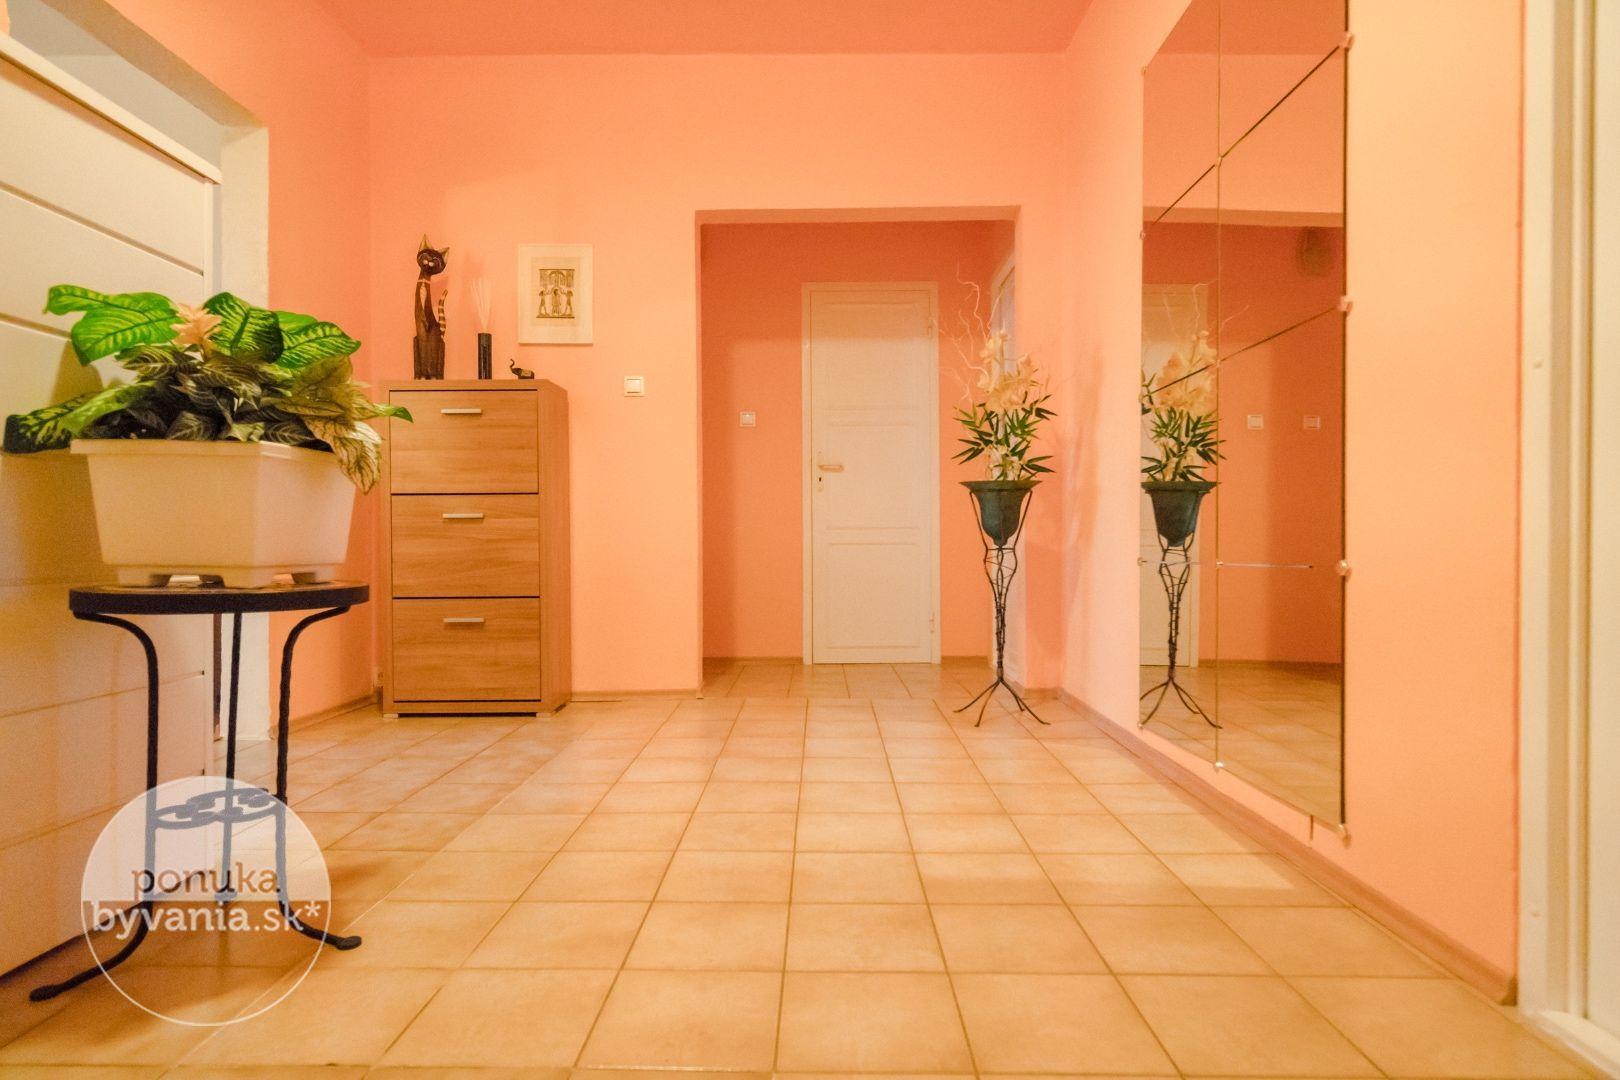 ponukabyvania.sk_Veternicová_3-izbový-byt_KOVÁČ